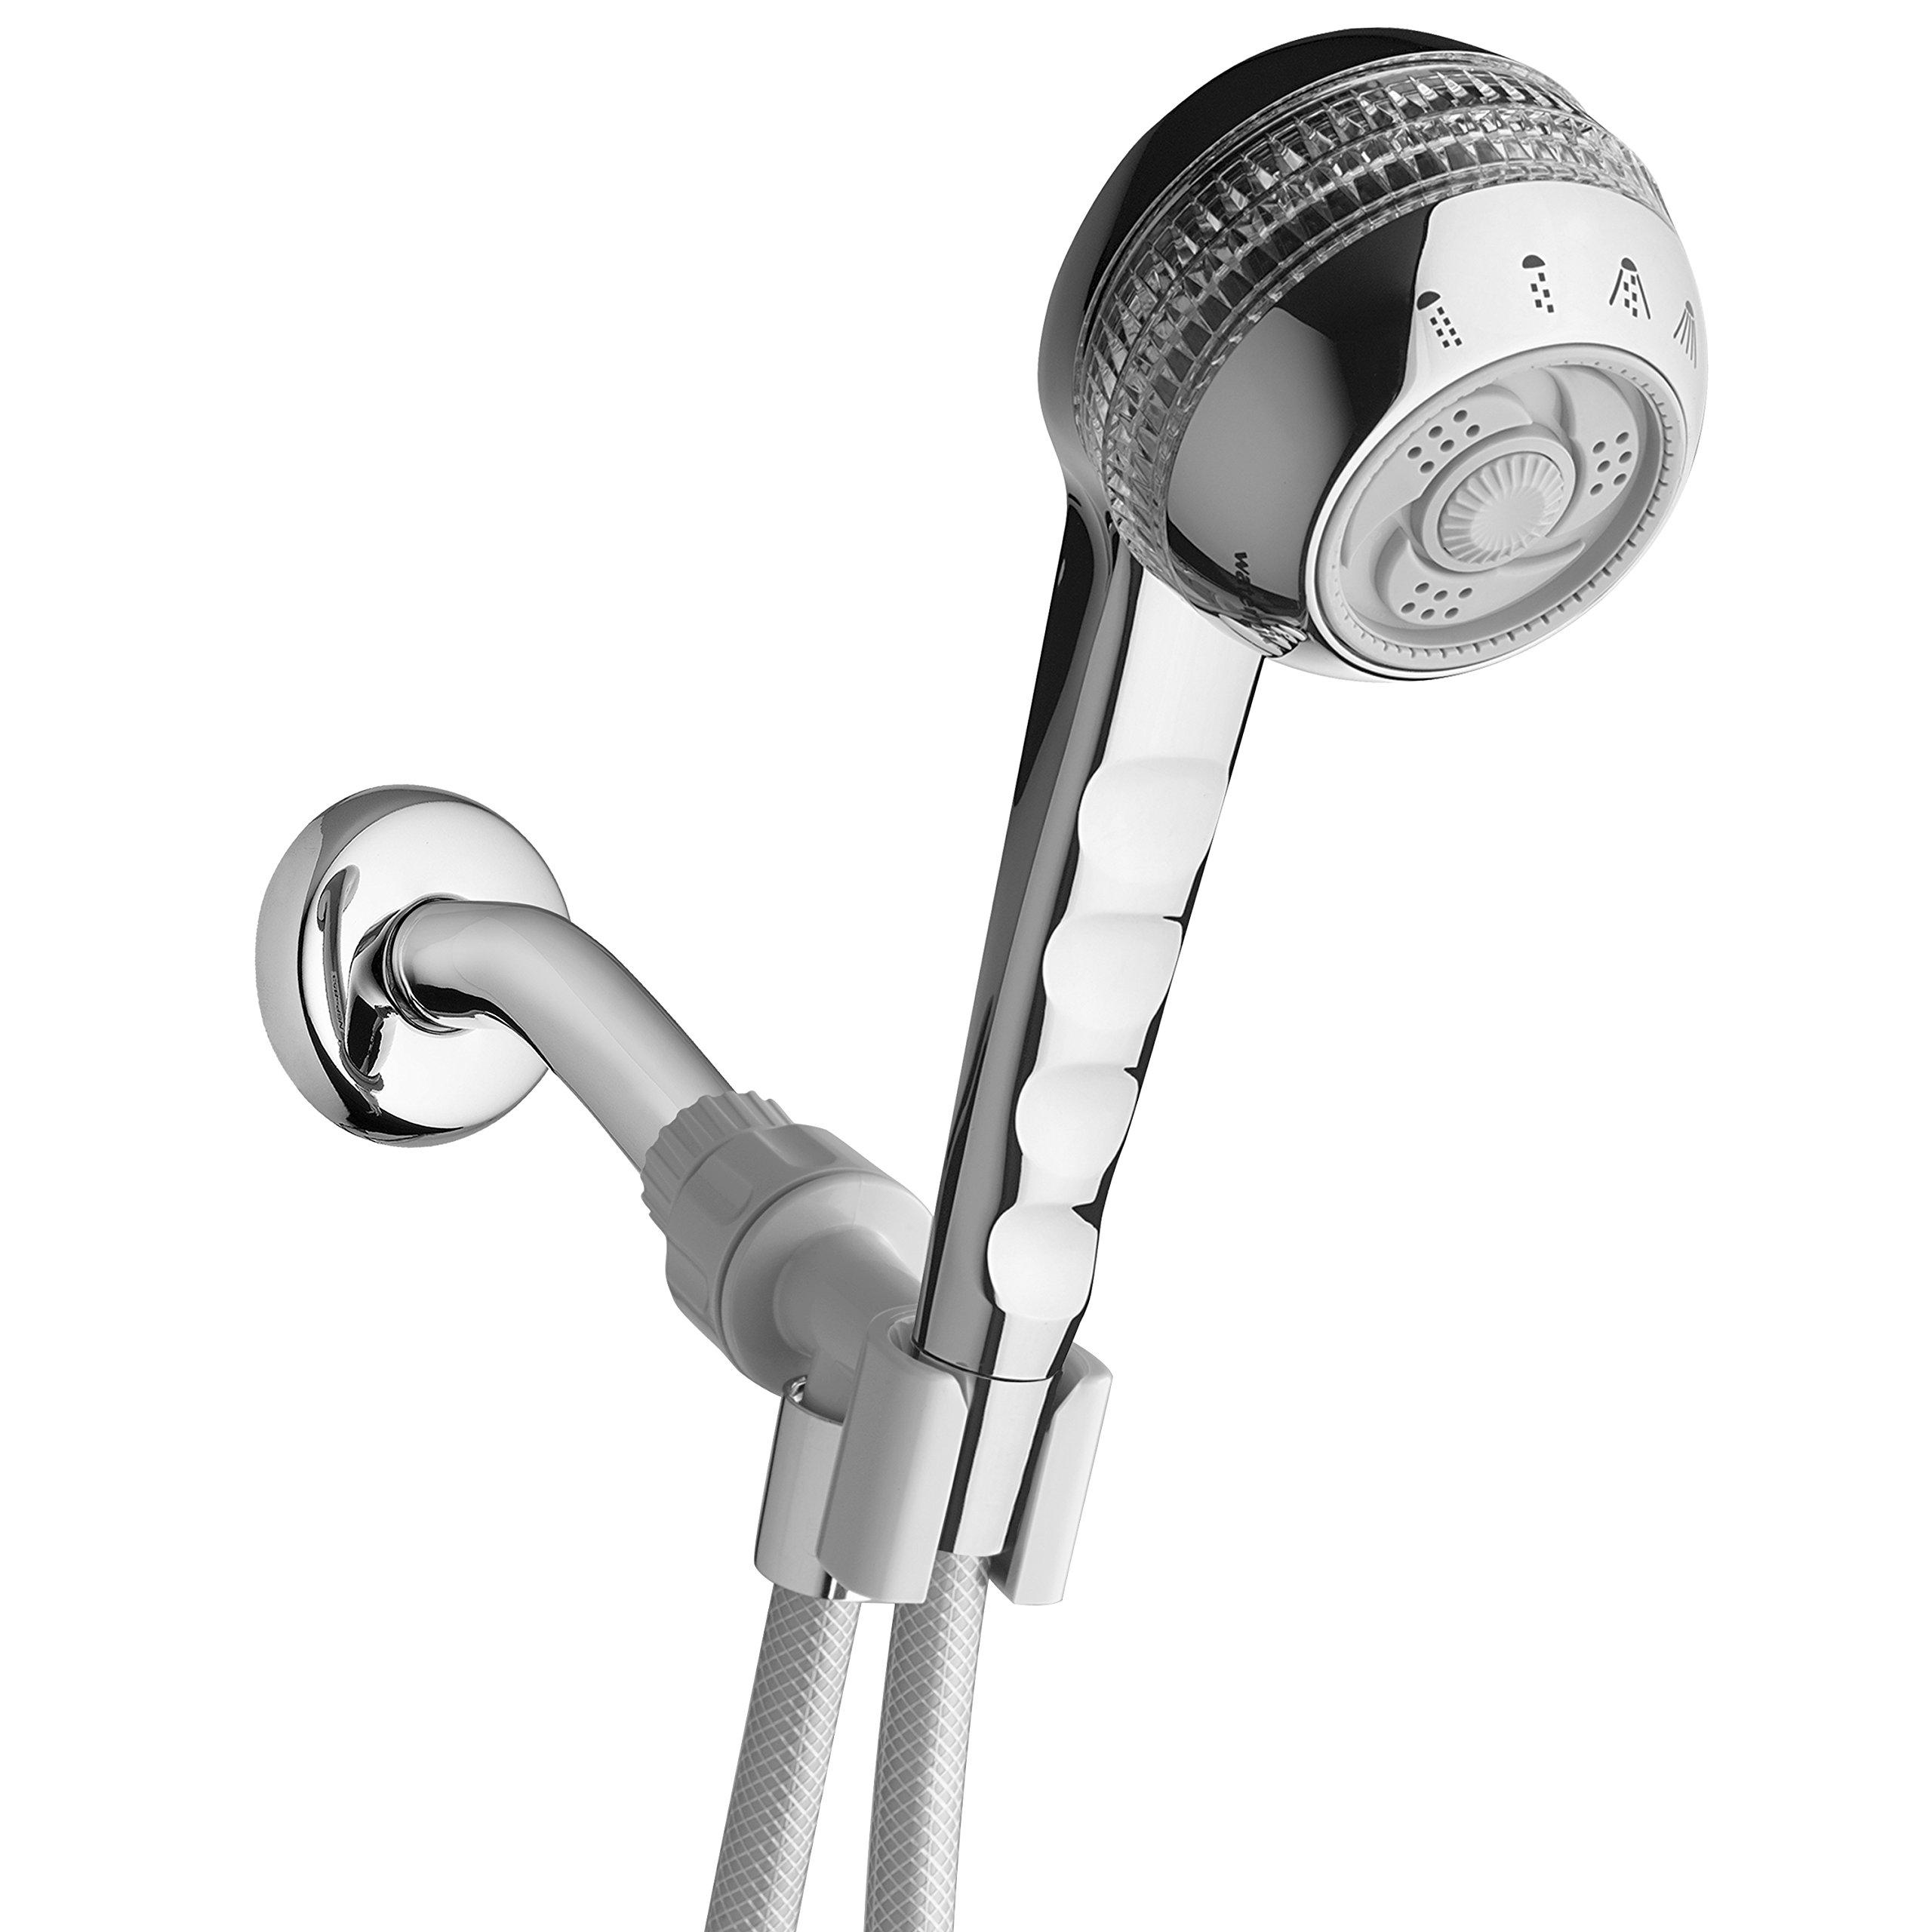 Waterpik SM-453CG Original 4-Mode Massage Handheld Shower, Chrome/Crystal by Waterpik